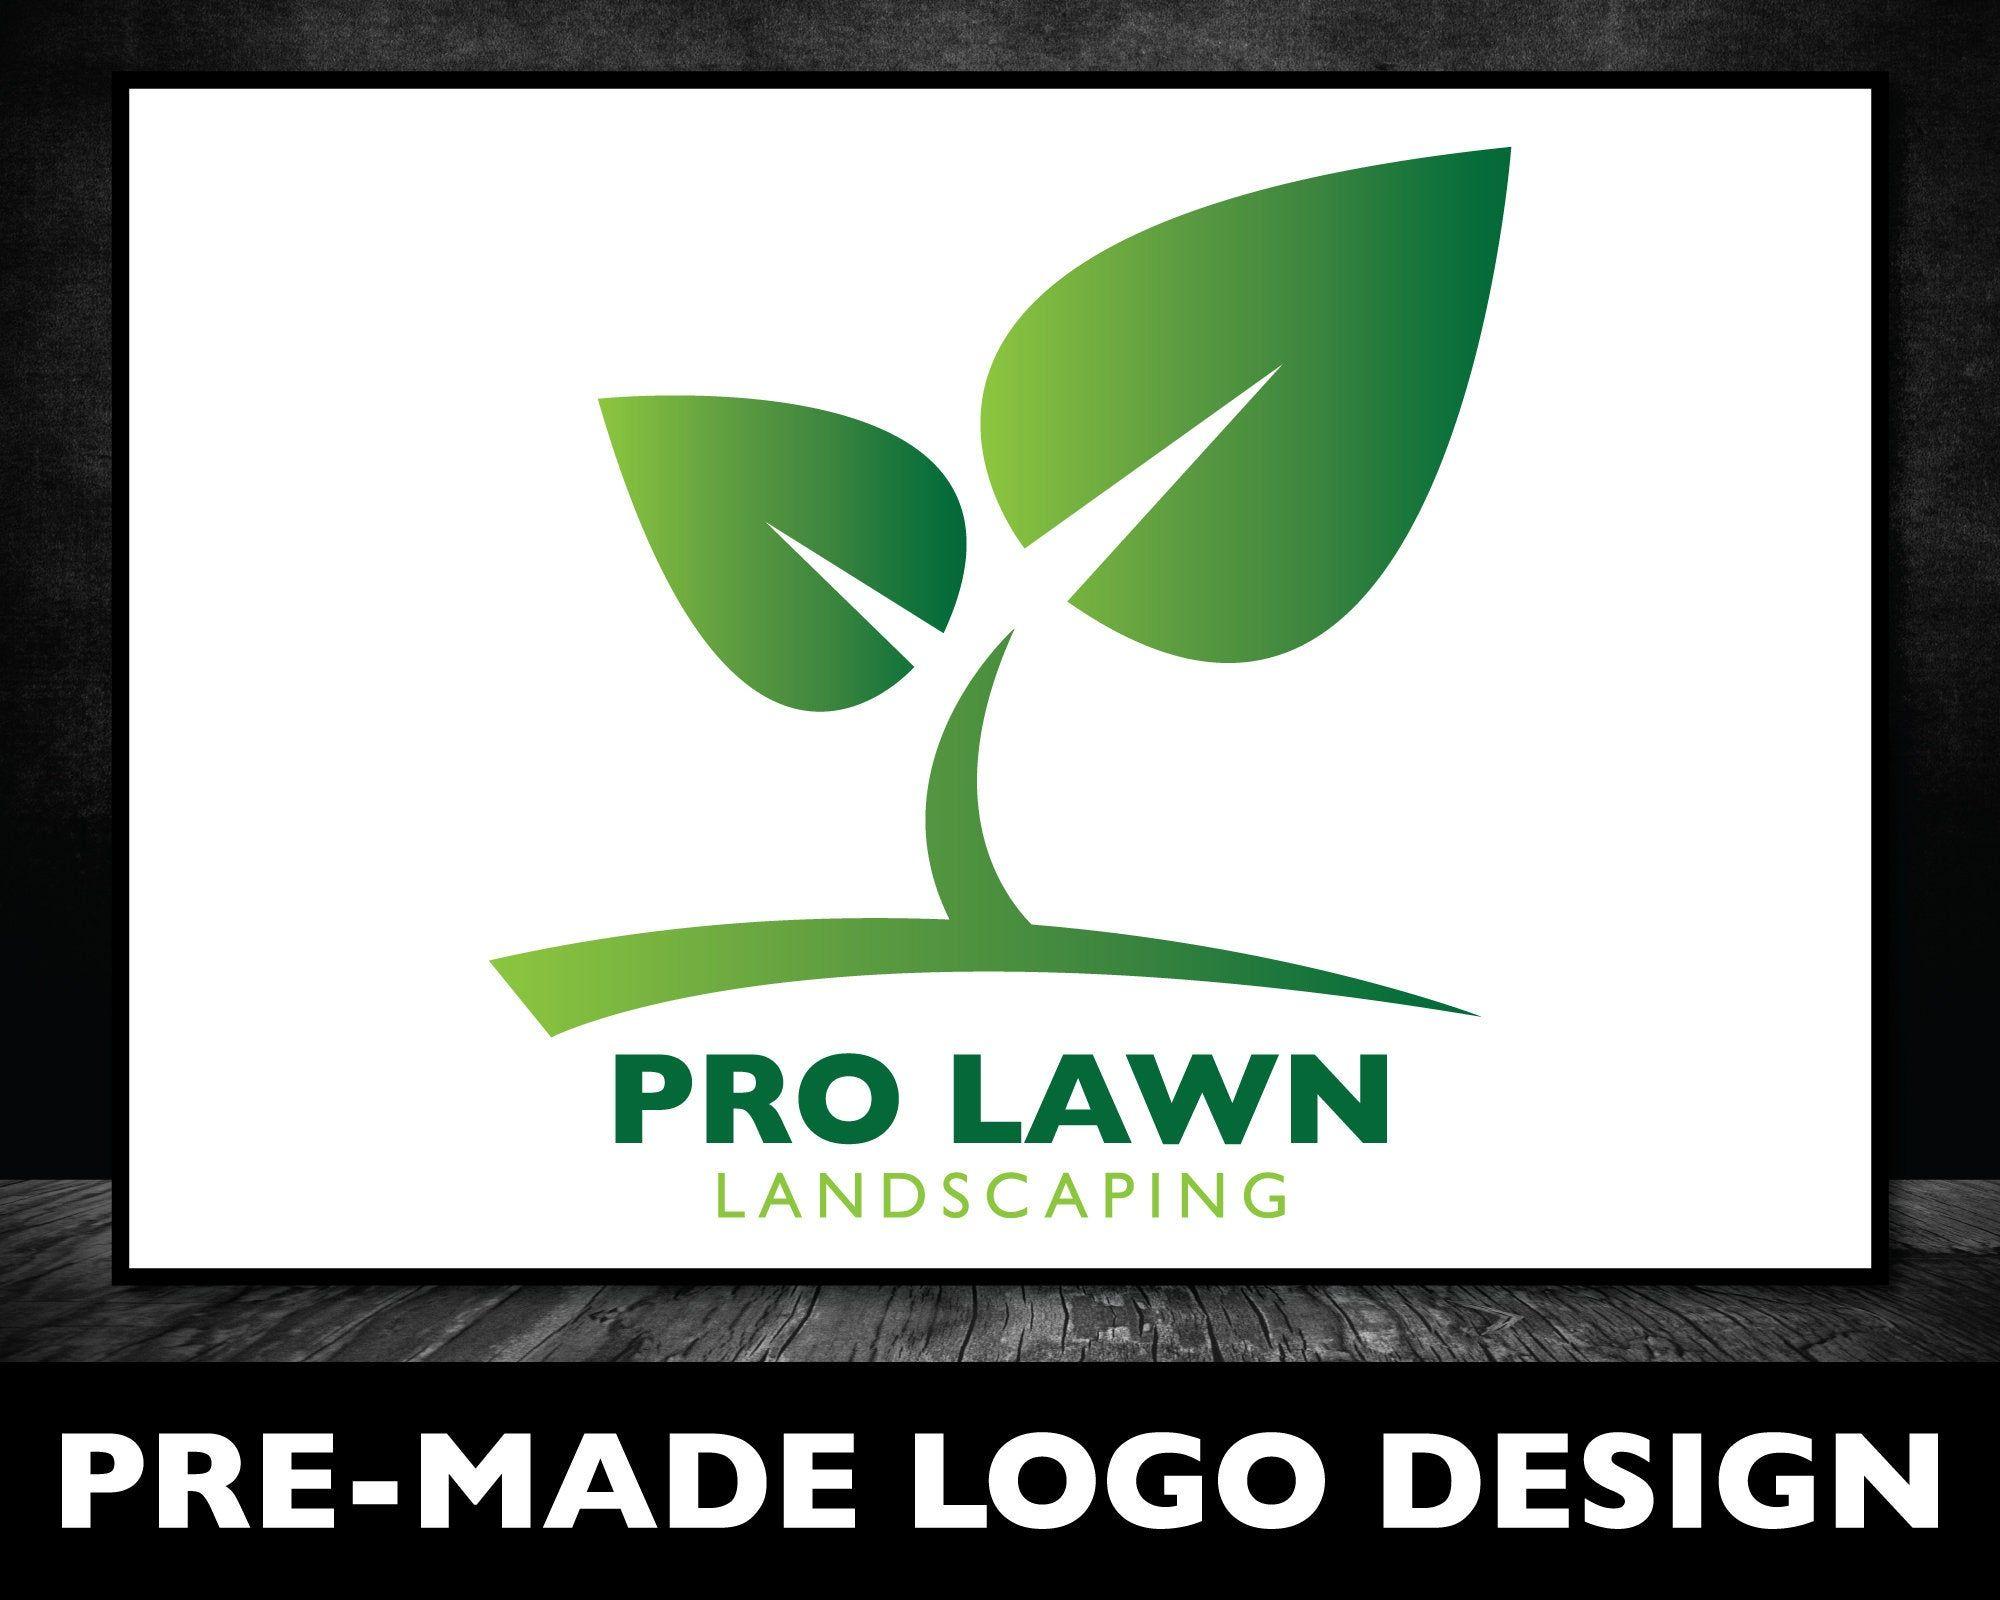 Lawn Care Logo Design   Lawn Maintenance   Landscaping Design   Lawn Design   Landscaper Logo   Outdoor Design   Landscape Marketing Logo